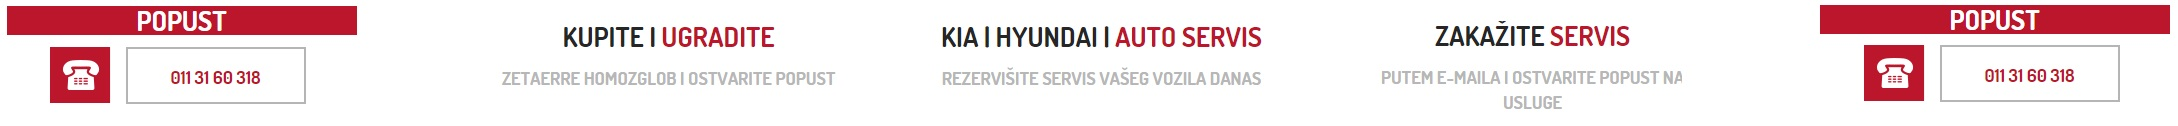 Kia i Ayundai auto servis Autoricambi plus doo, Zemun, Beograd